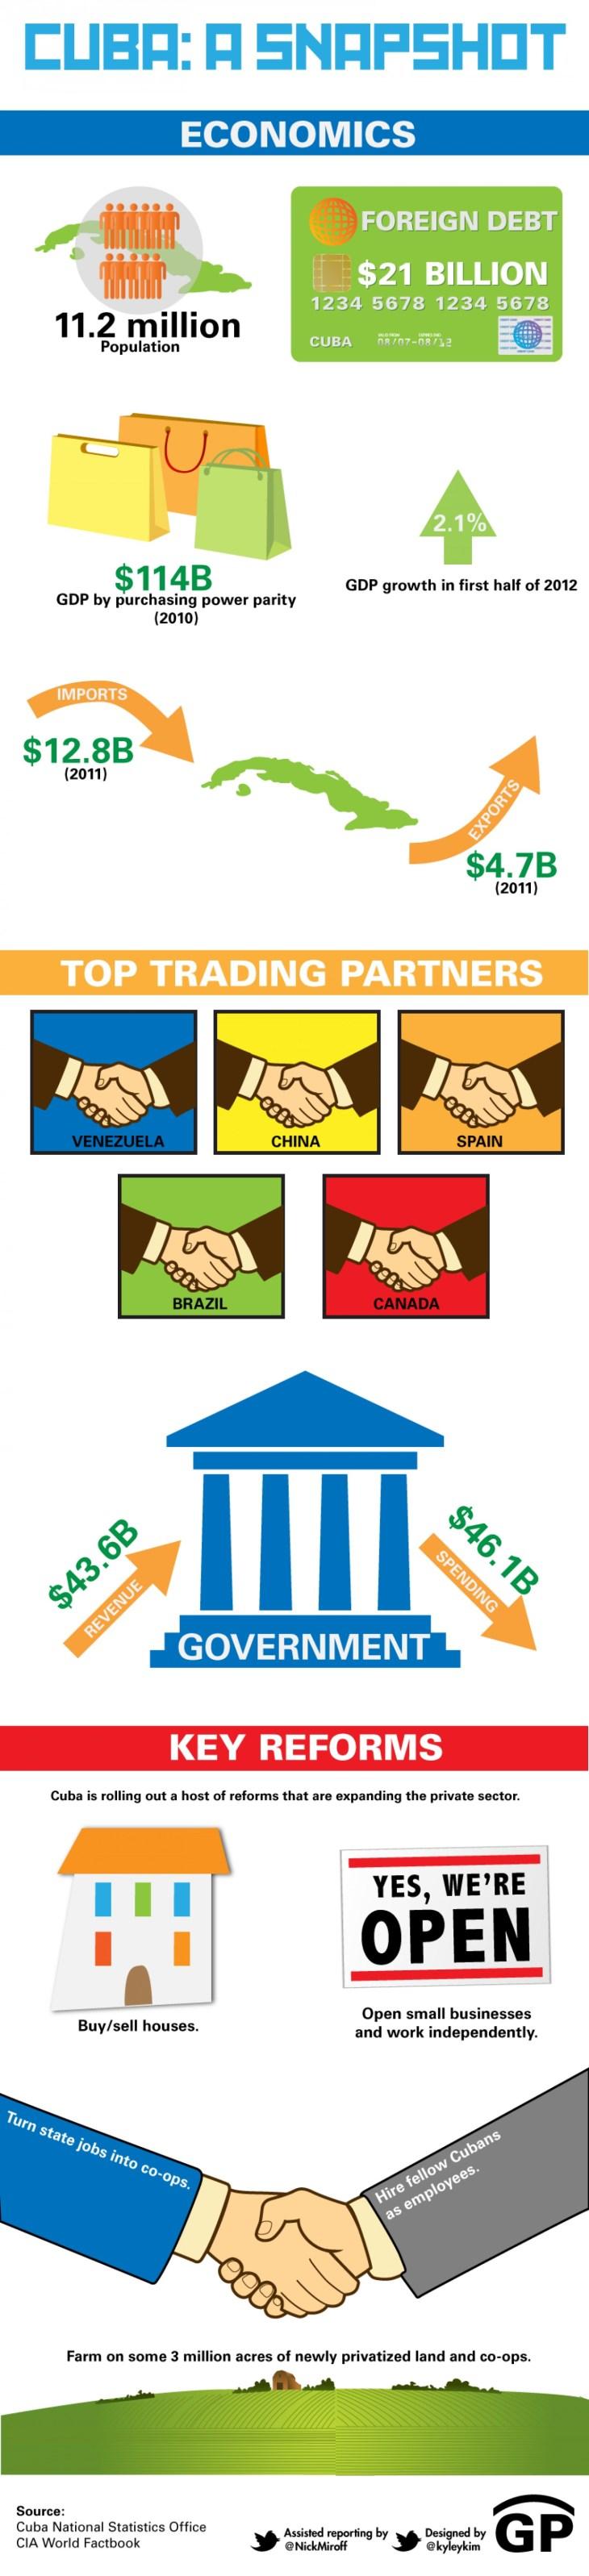 cuban economic reforms infographic